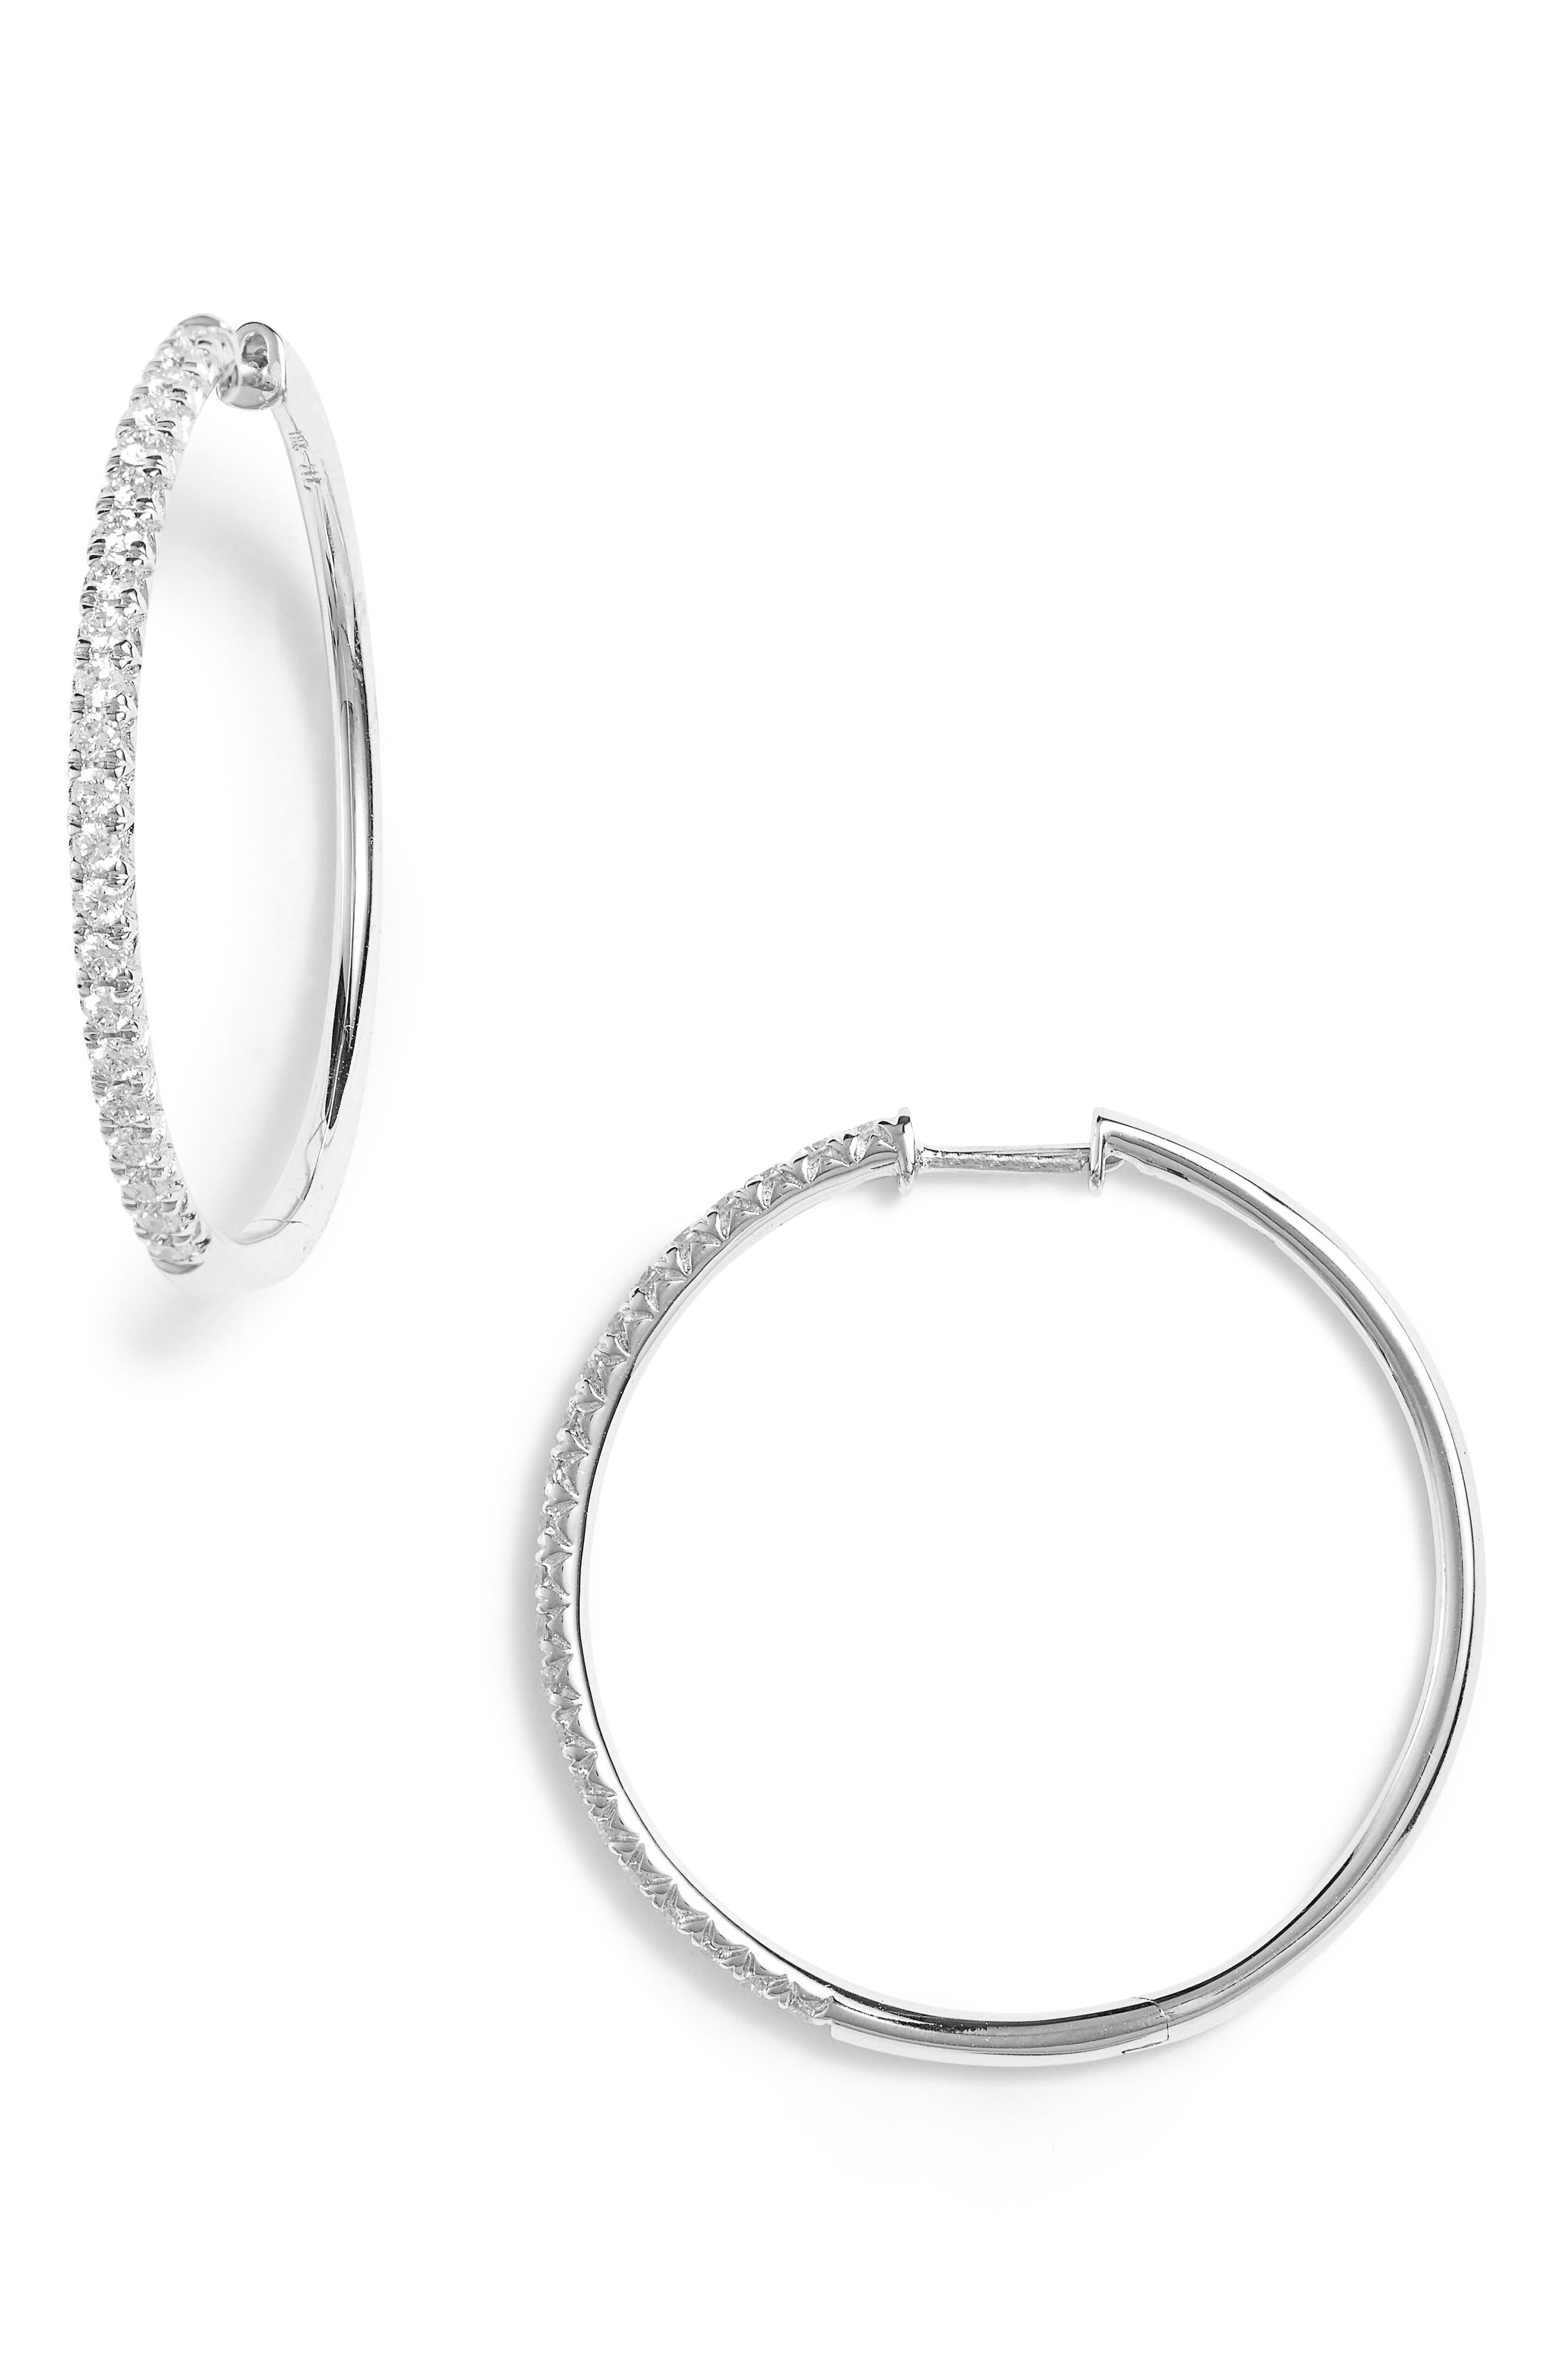 Kiera French Cut Diamond Hoop Earrings,                         Main,                         color, White Gold